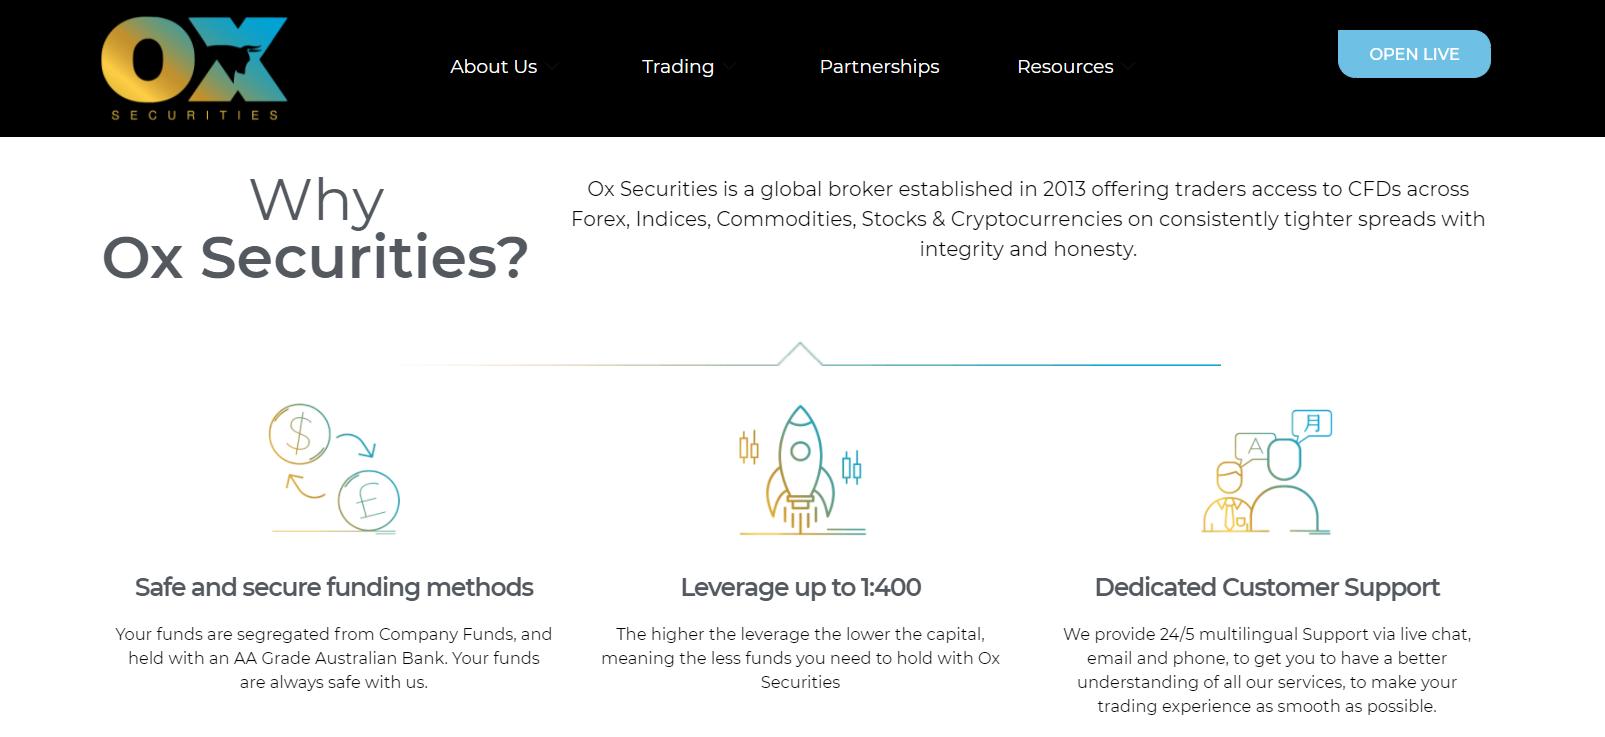 ox traders торговые условия